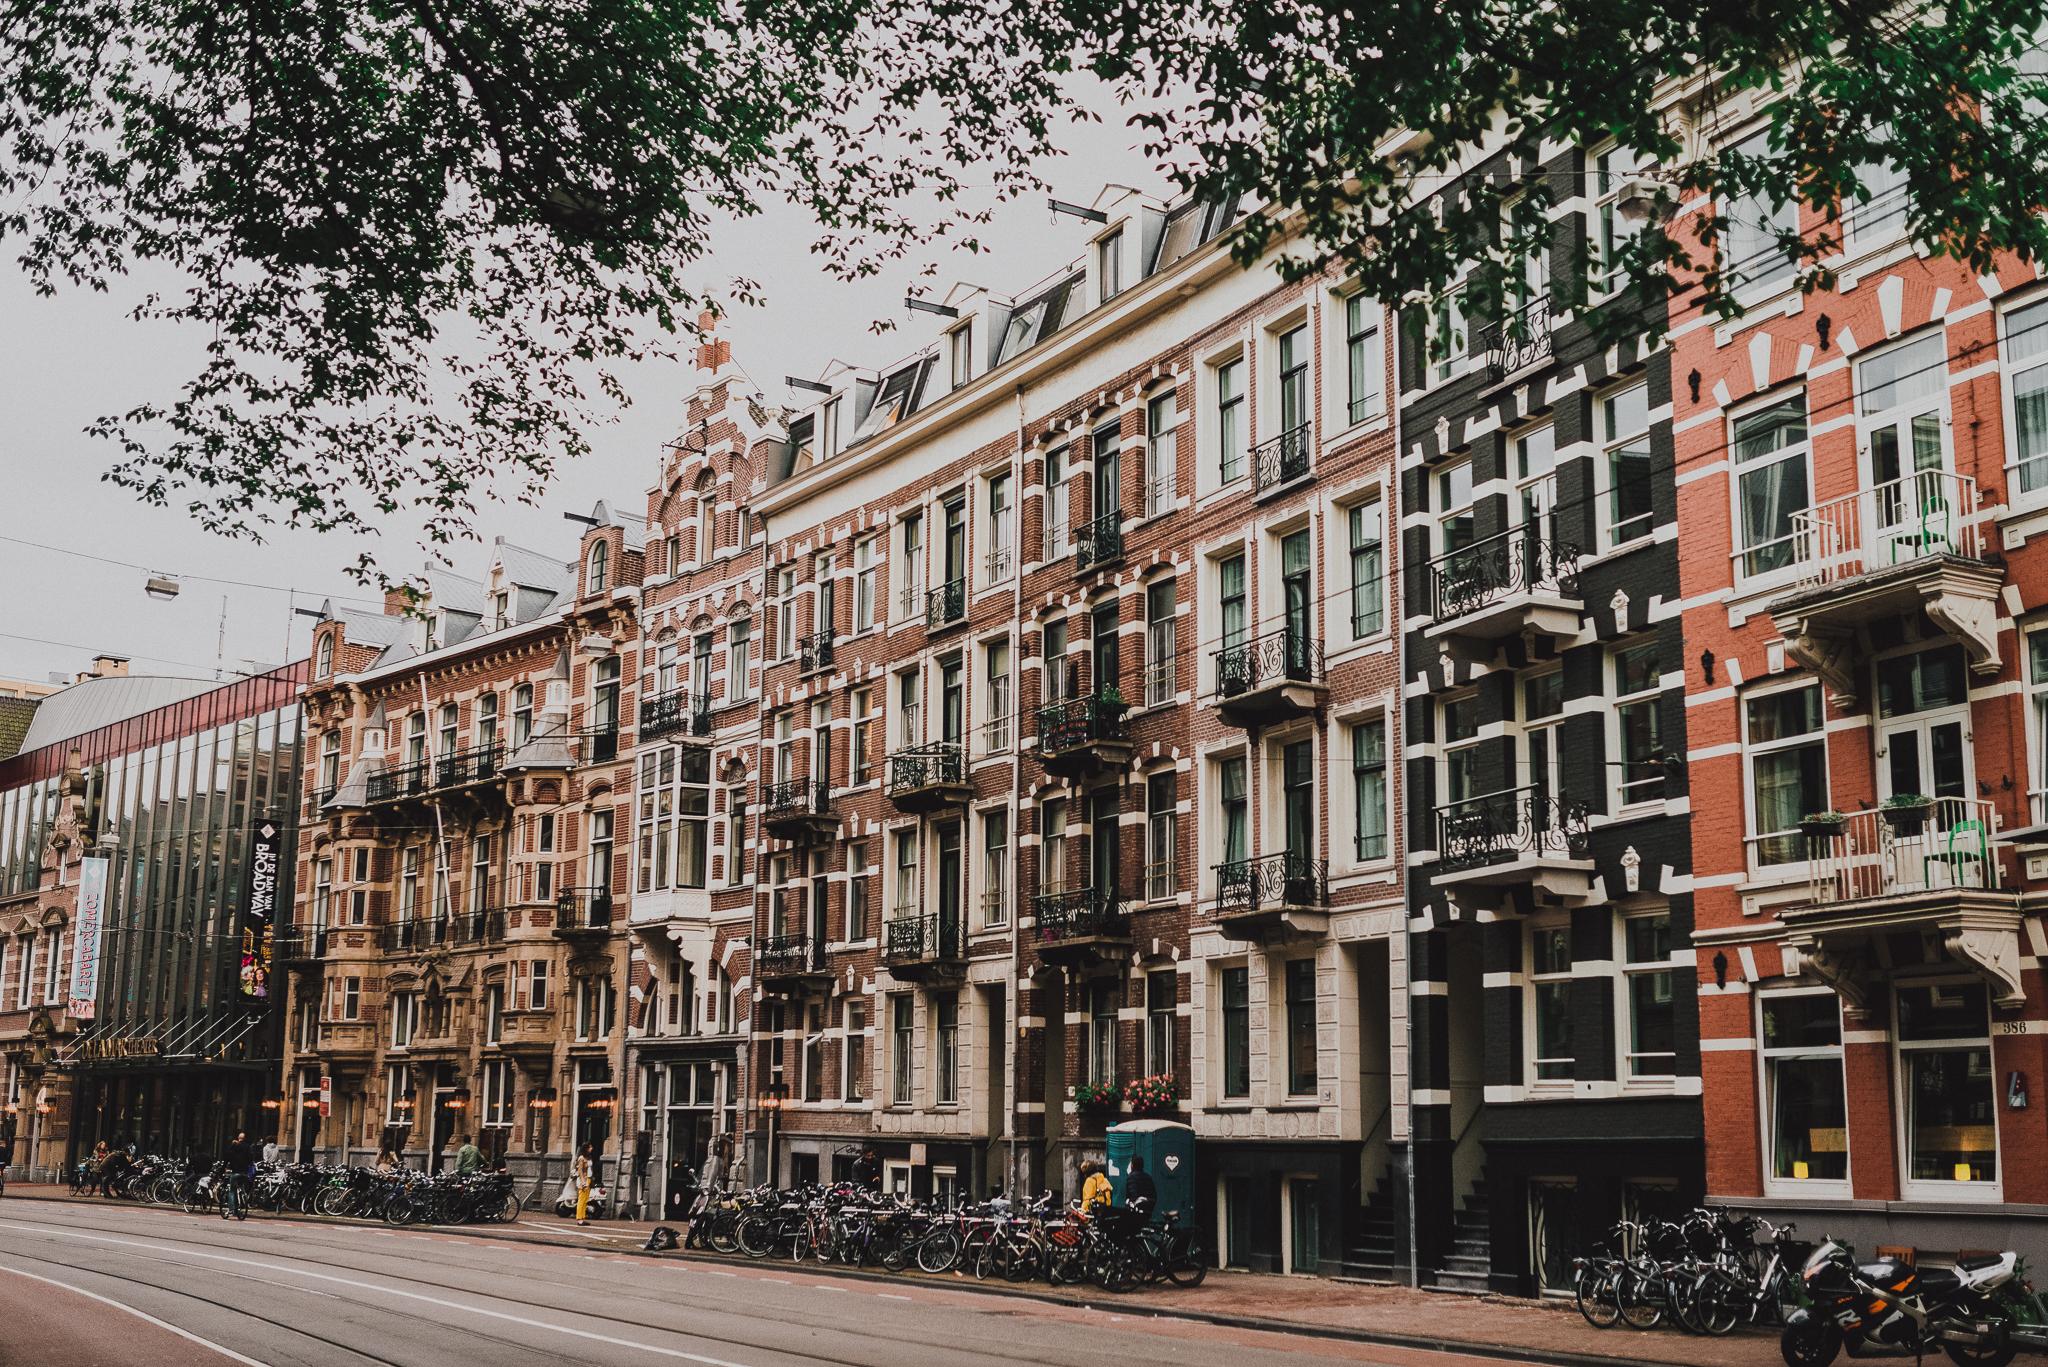 Amsterdam (11 of 12).jpg